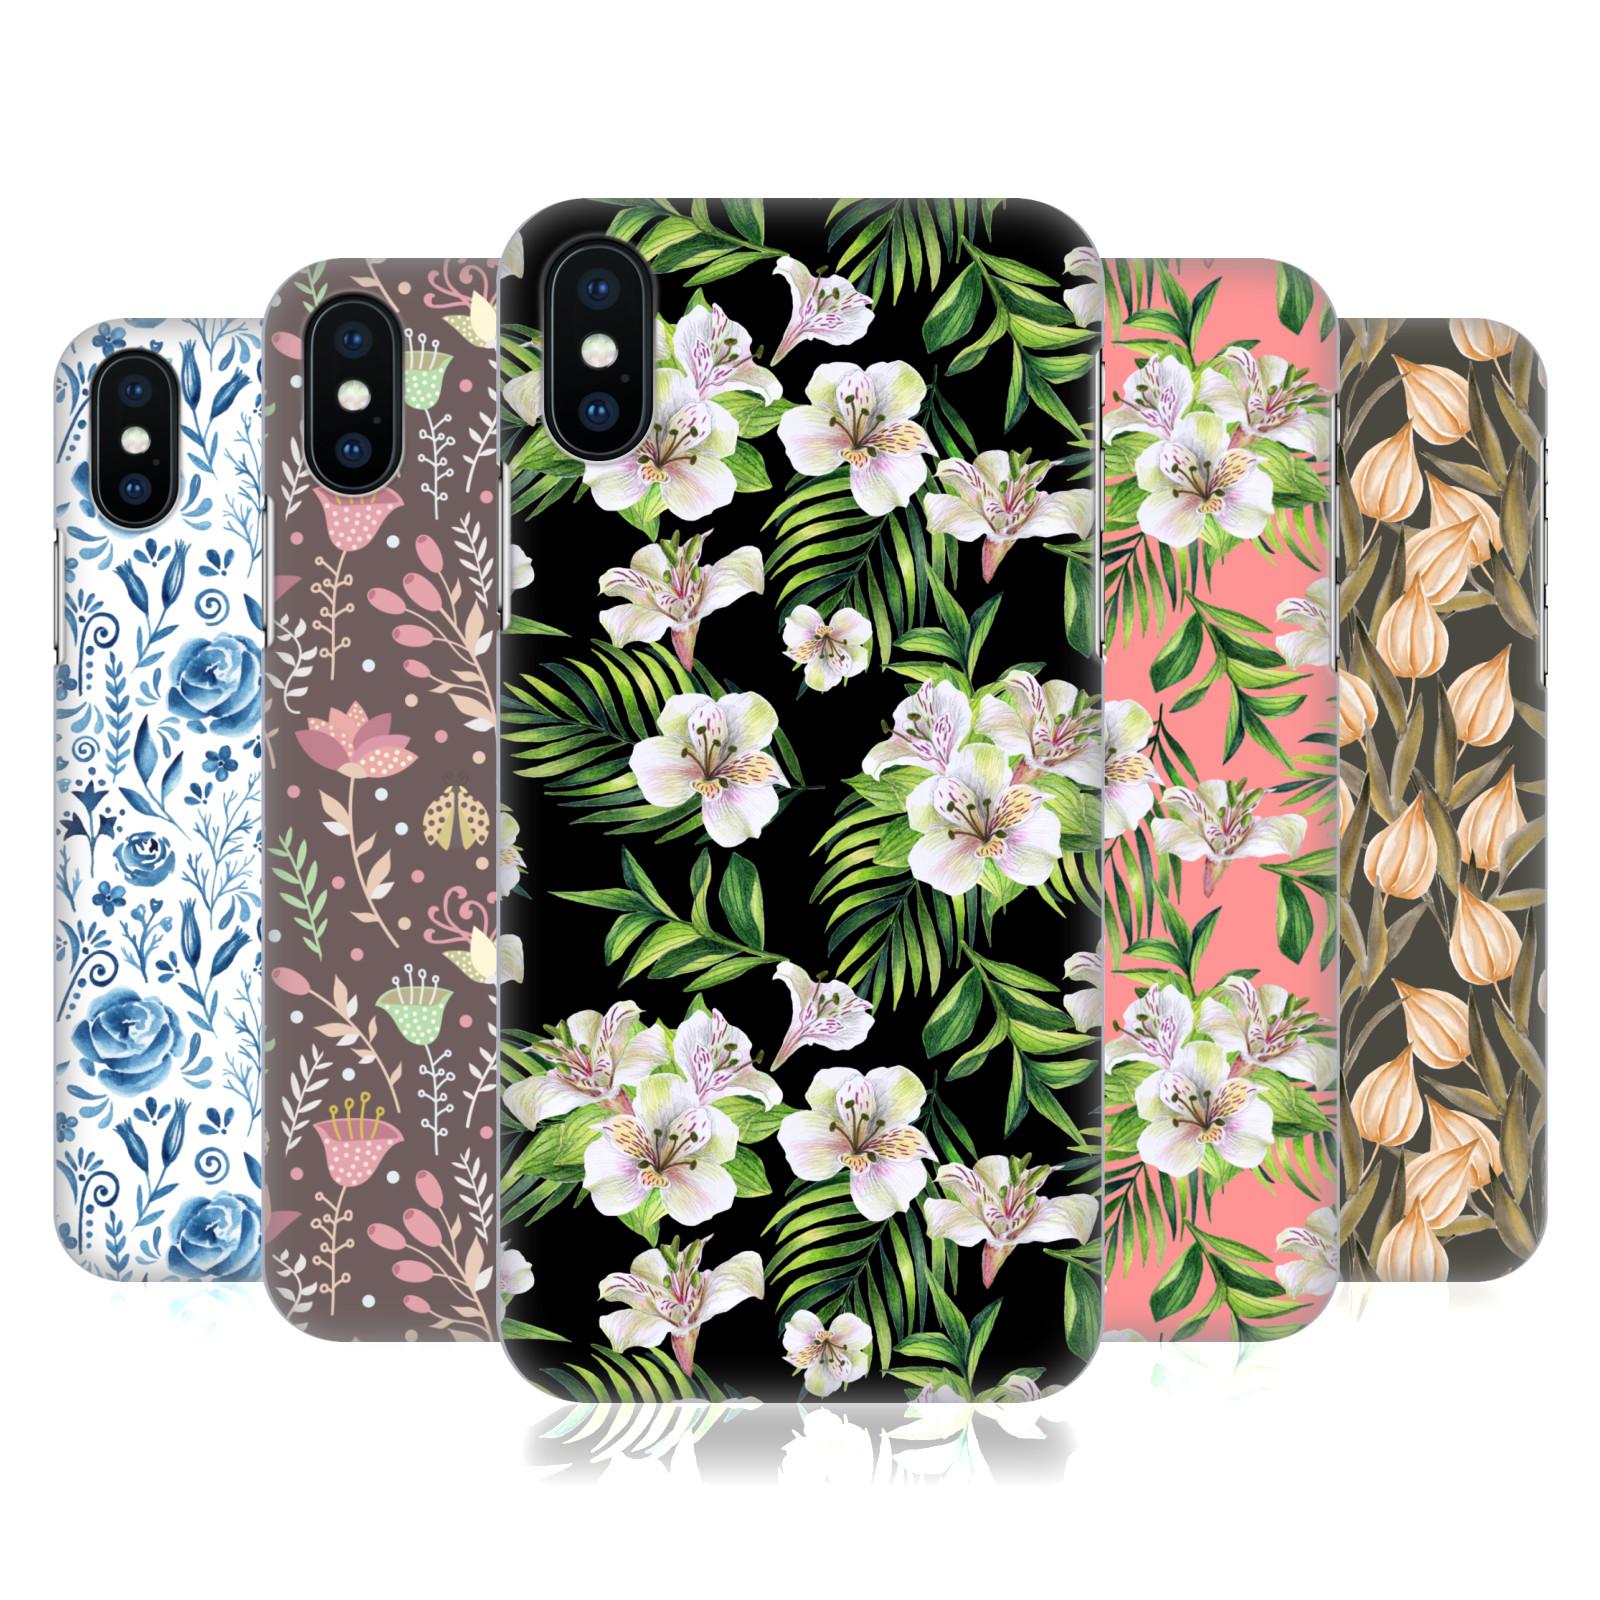 Julia Badeeva  Floral Patterns 2